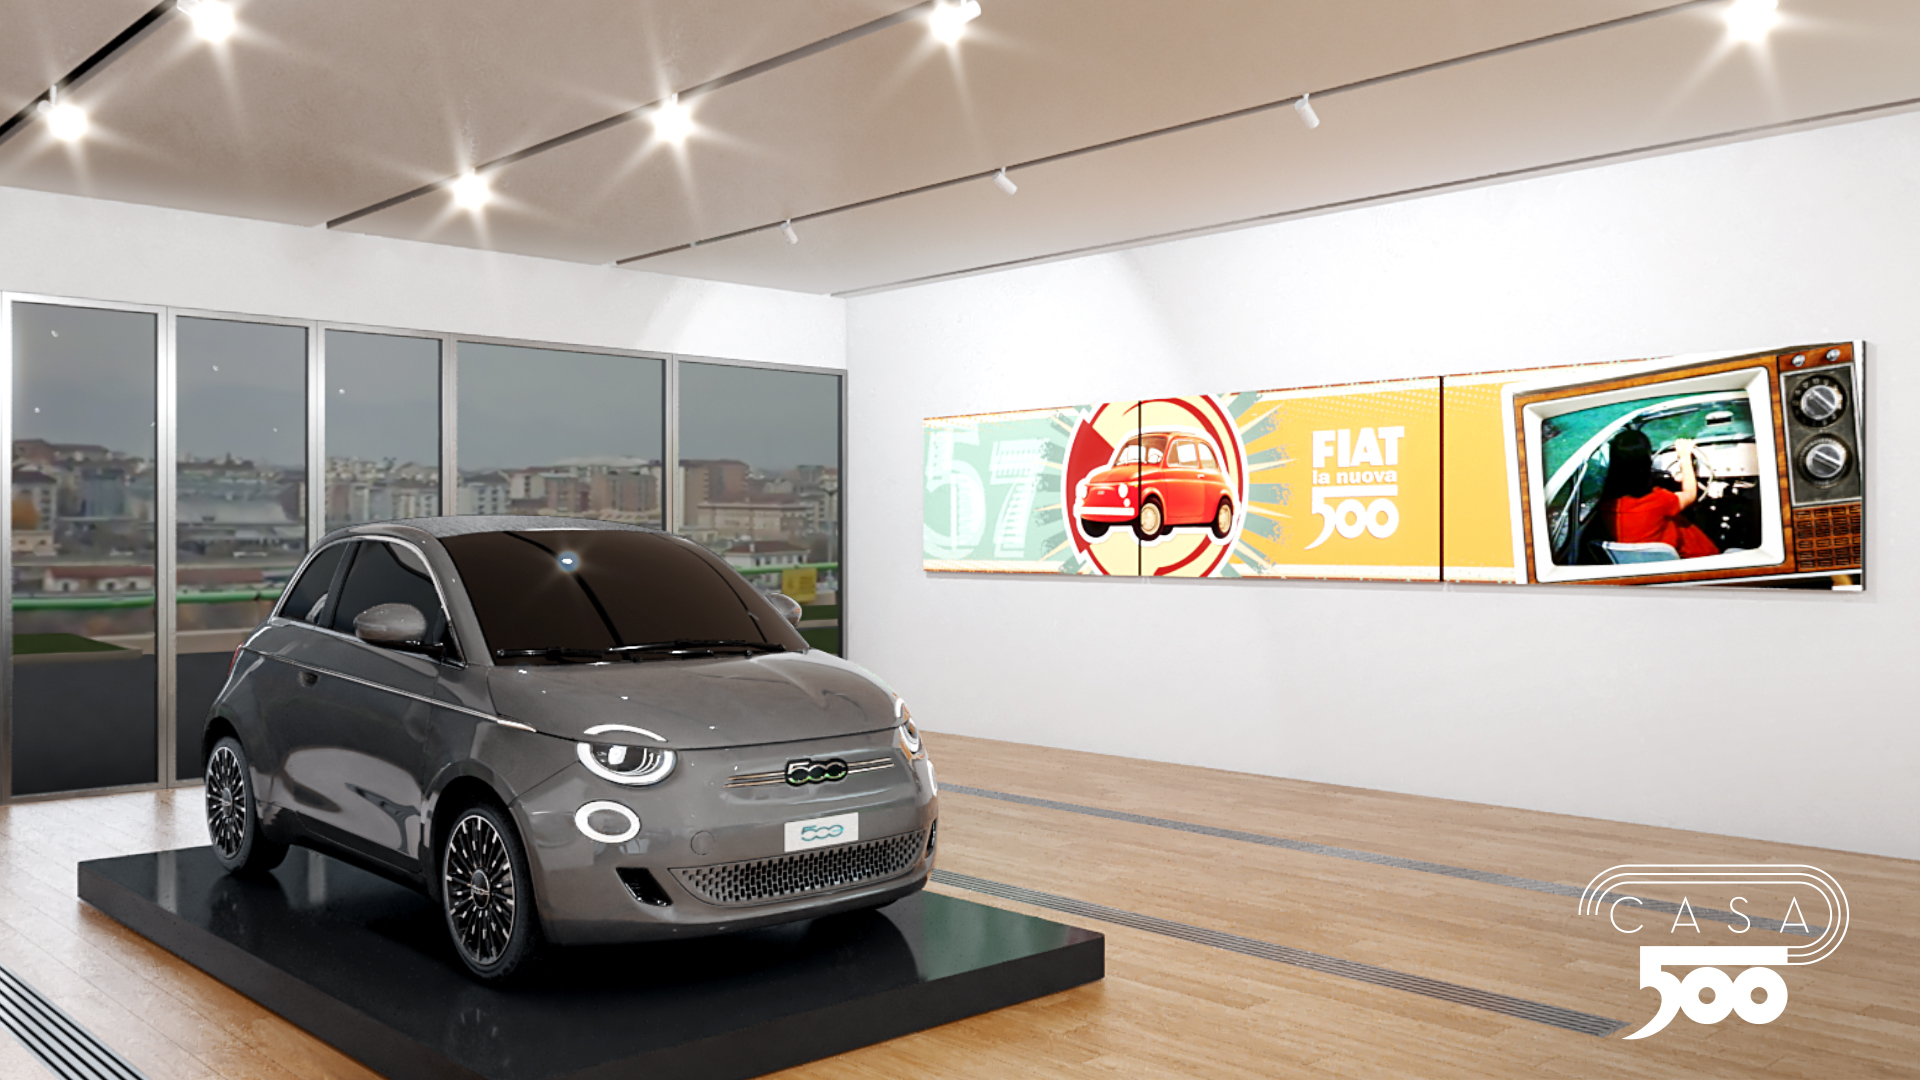 Fiat 500 Exposicion (2)